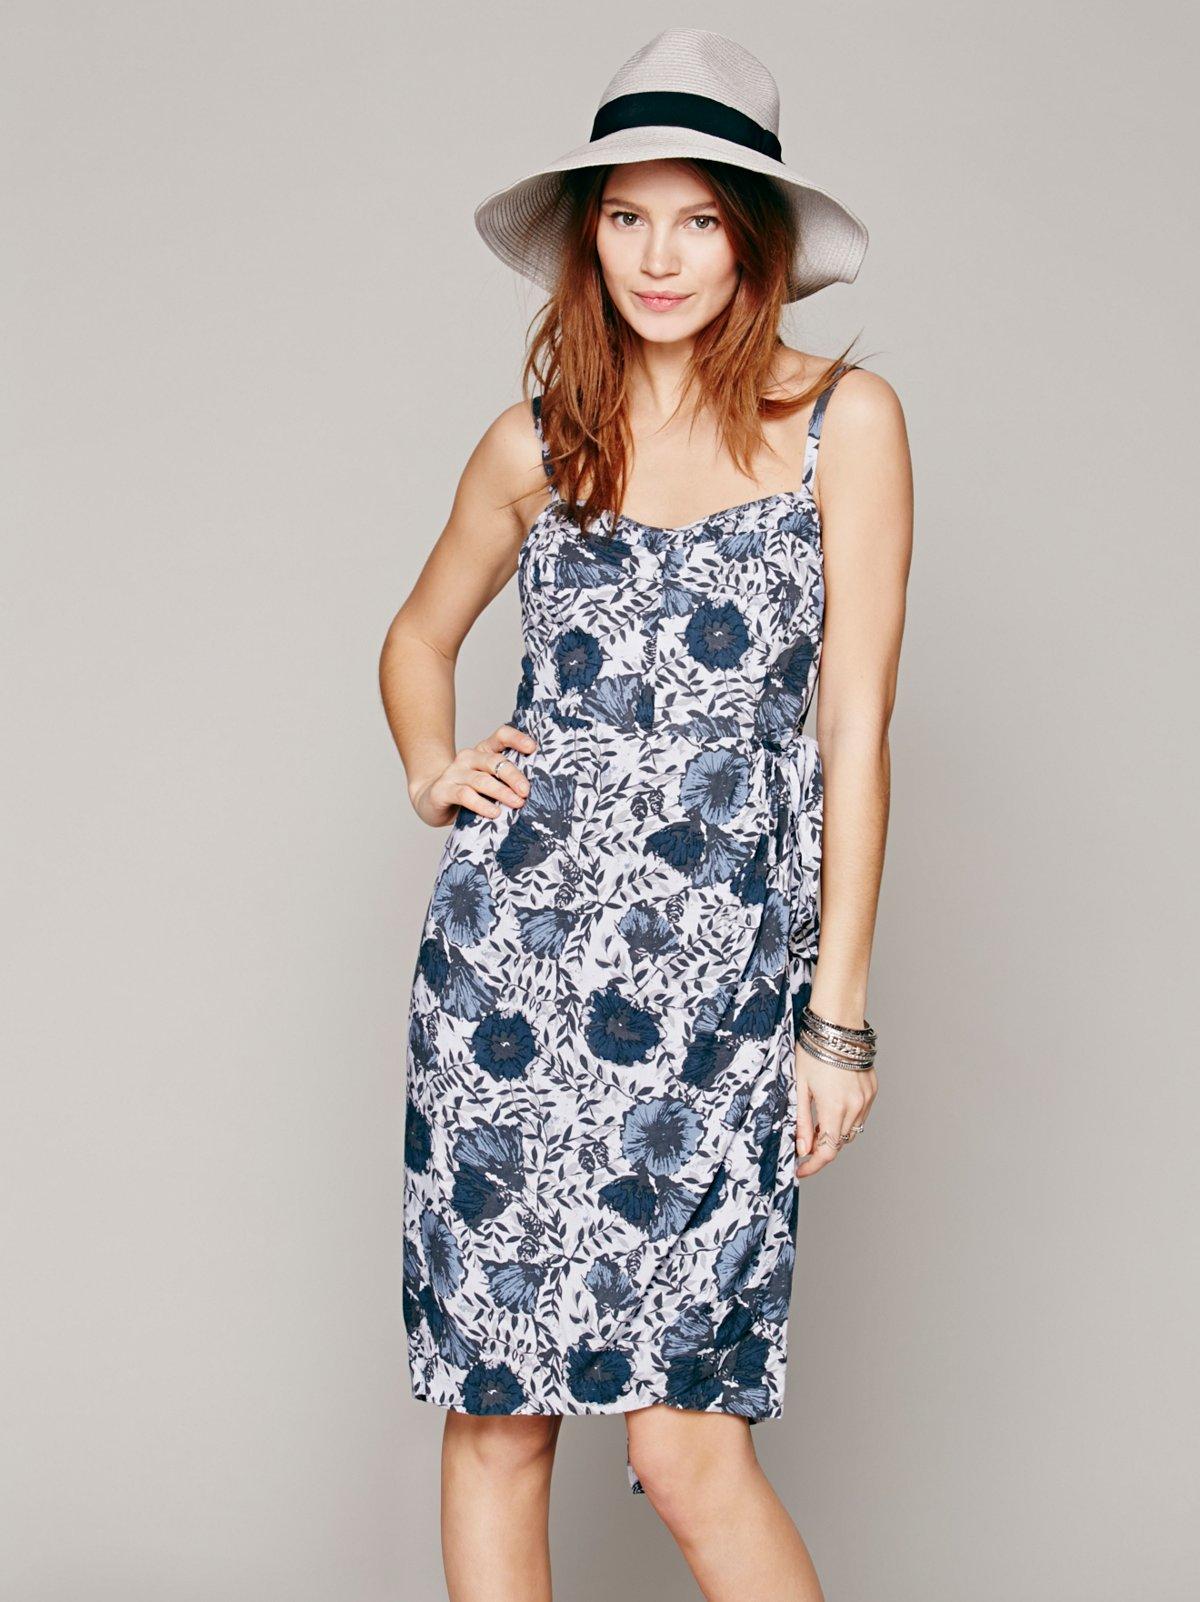 Hilo Hottie Dress